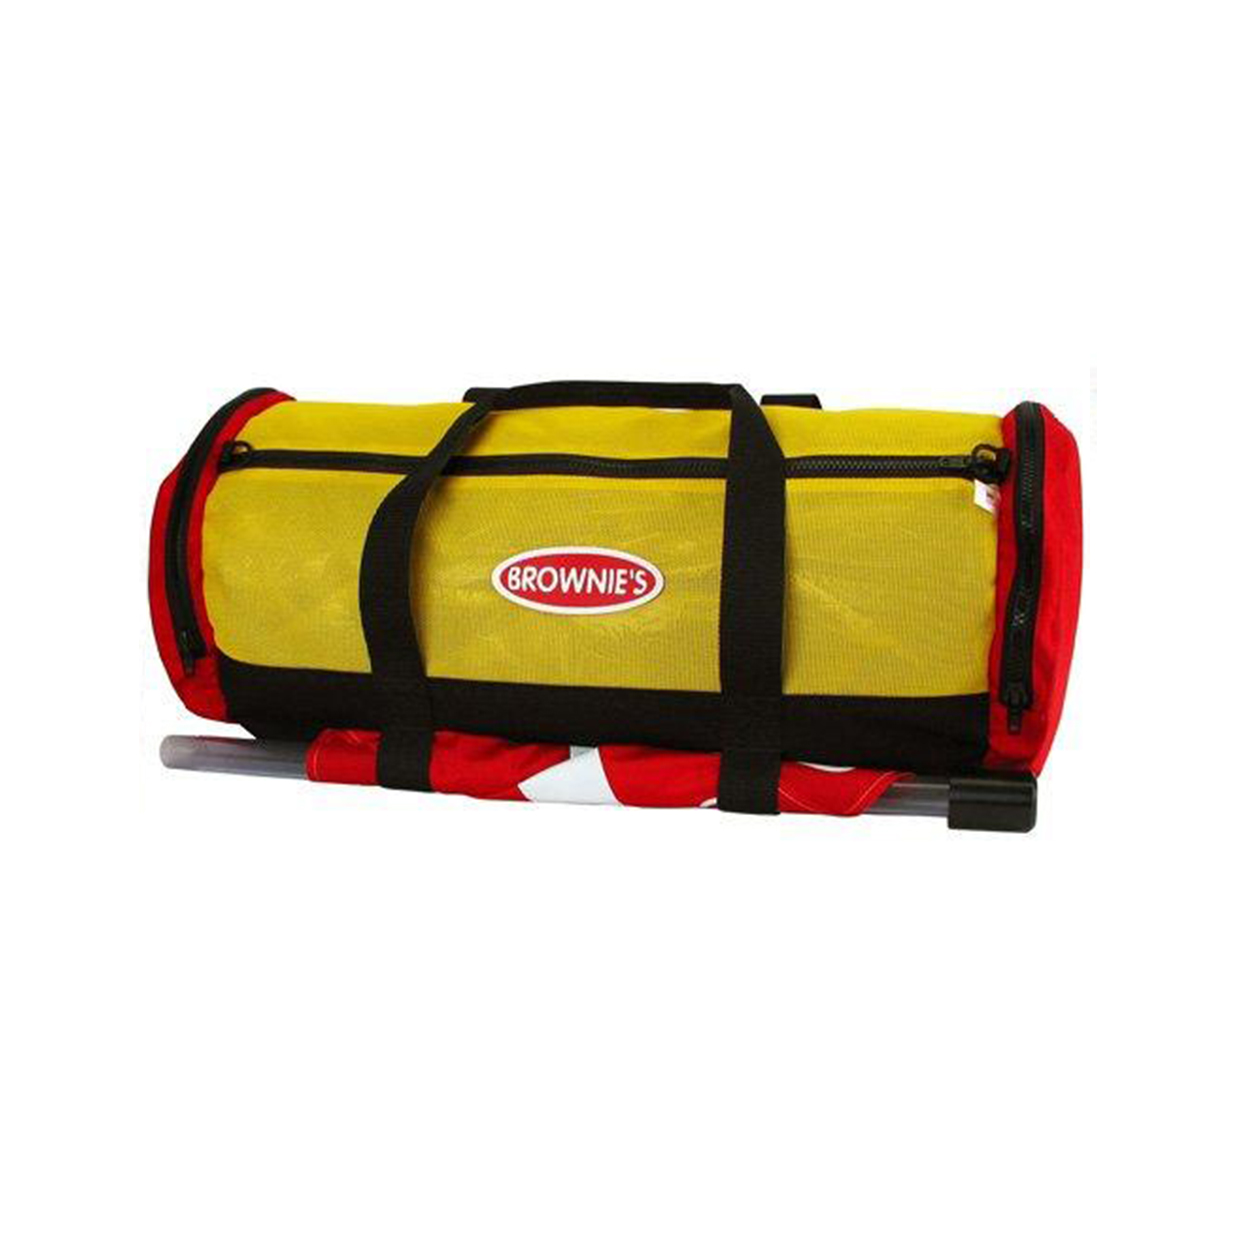 Brownie's Explorer Tankless Hookah Diving System Carry Bag